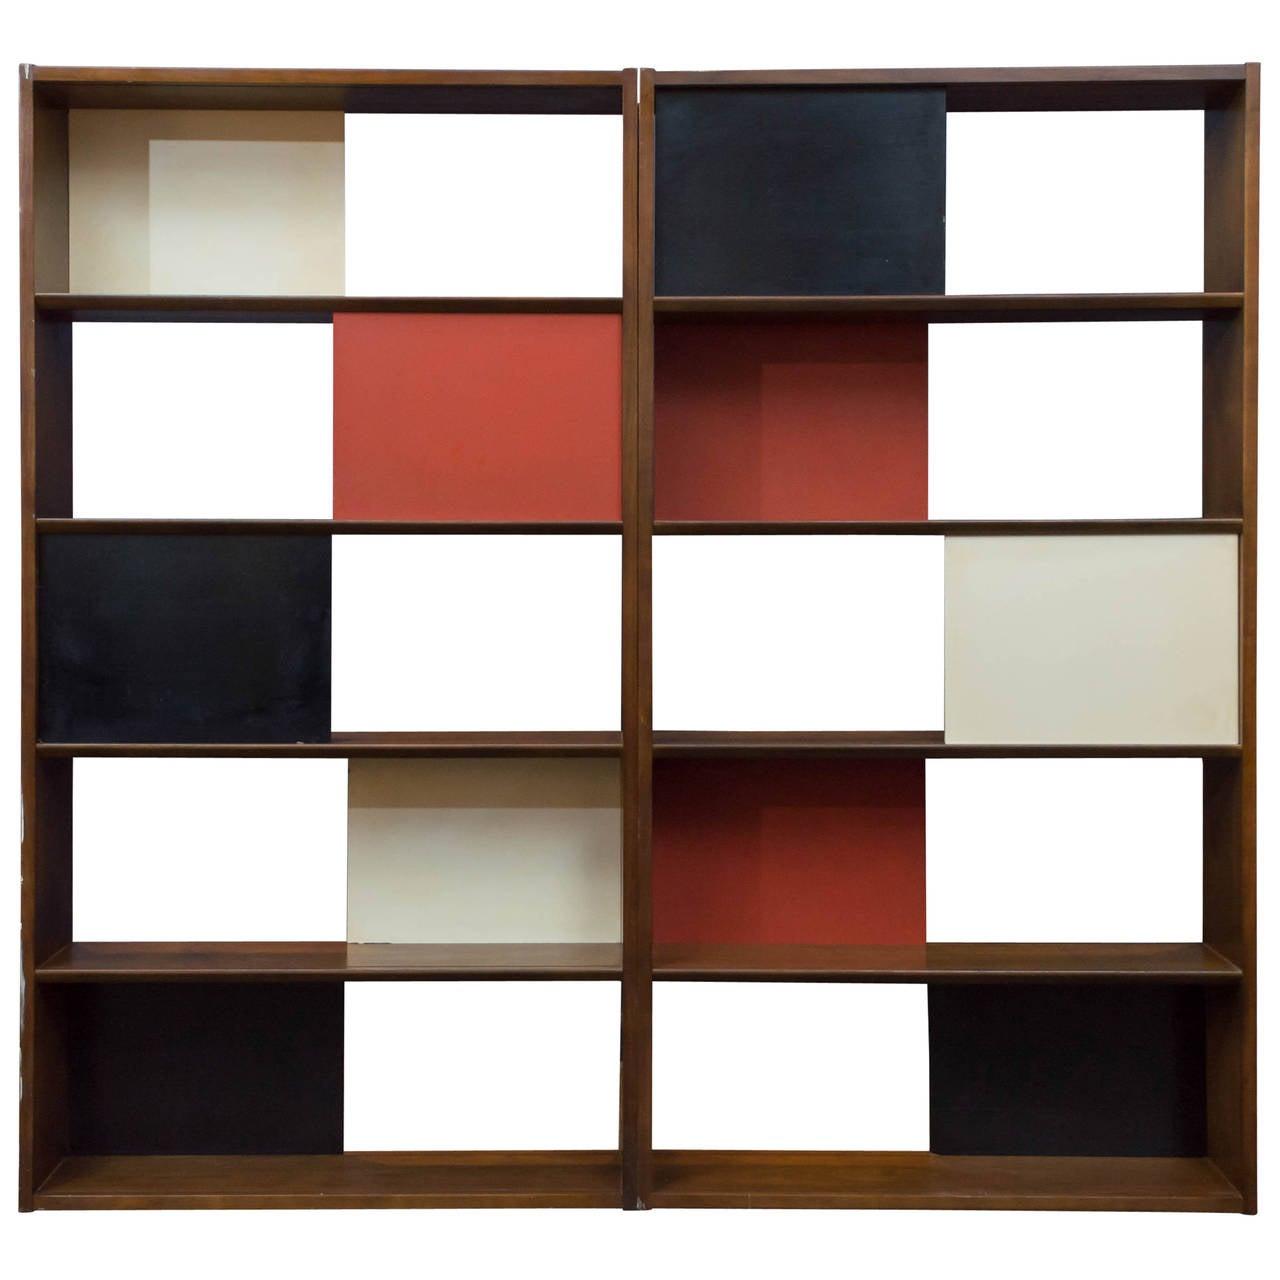 Room Divider or Bookcase by Evans Clark for Glenn 1